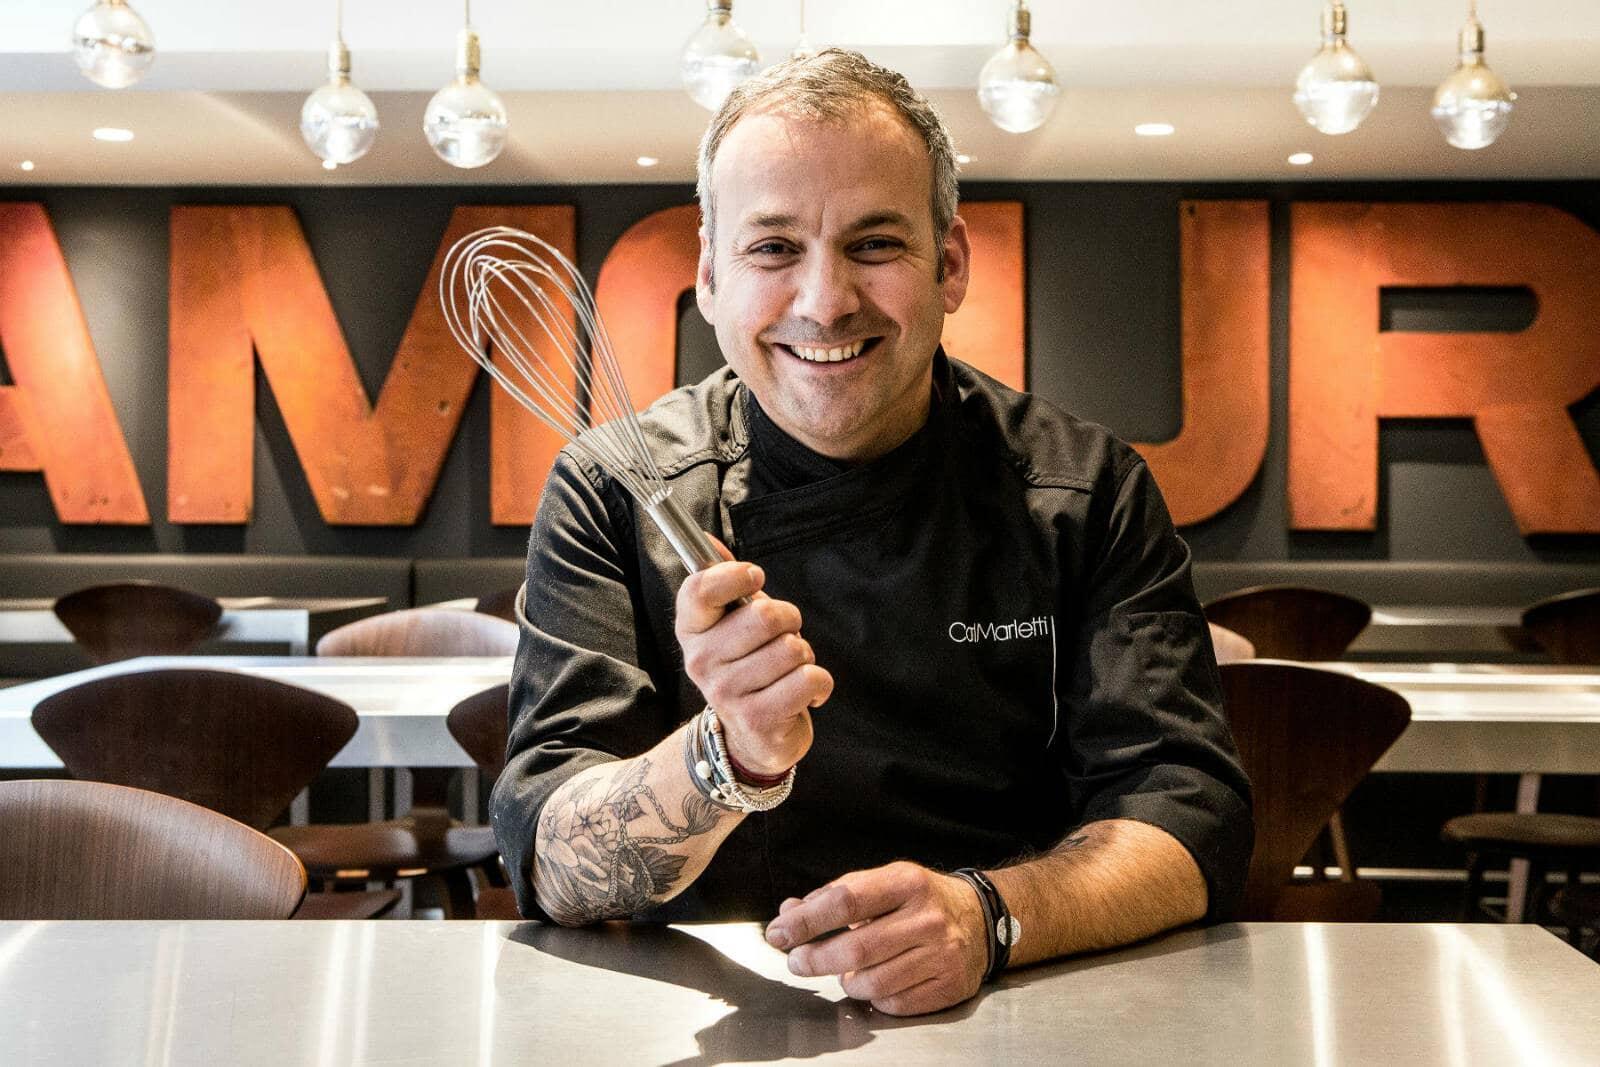 Le chef pâtissier Carl Marletti.